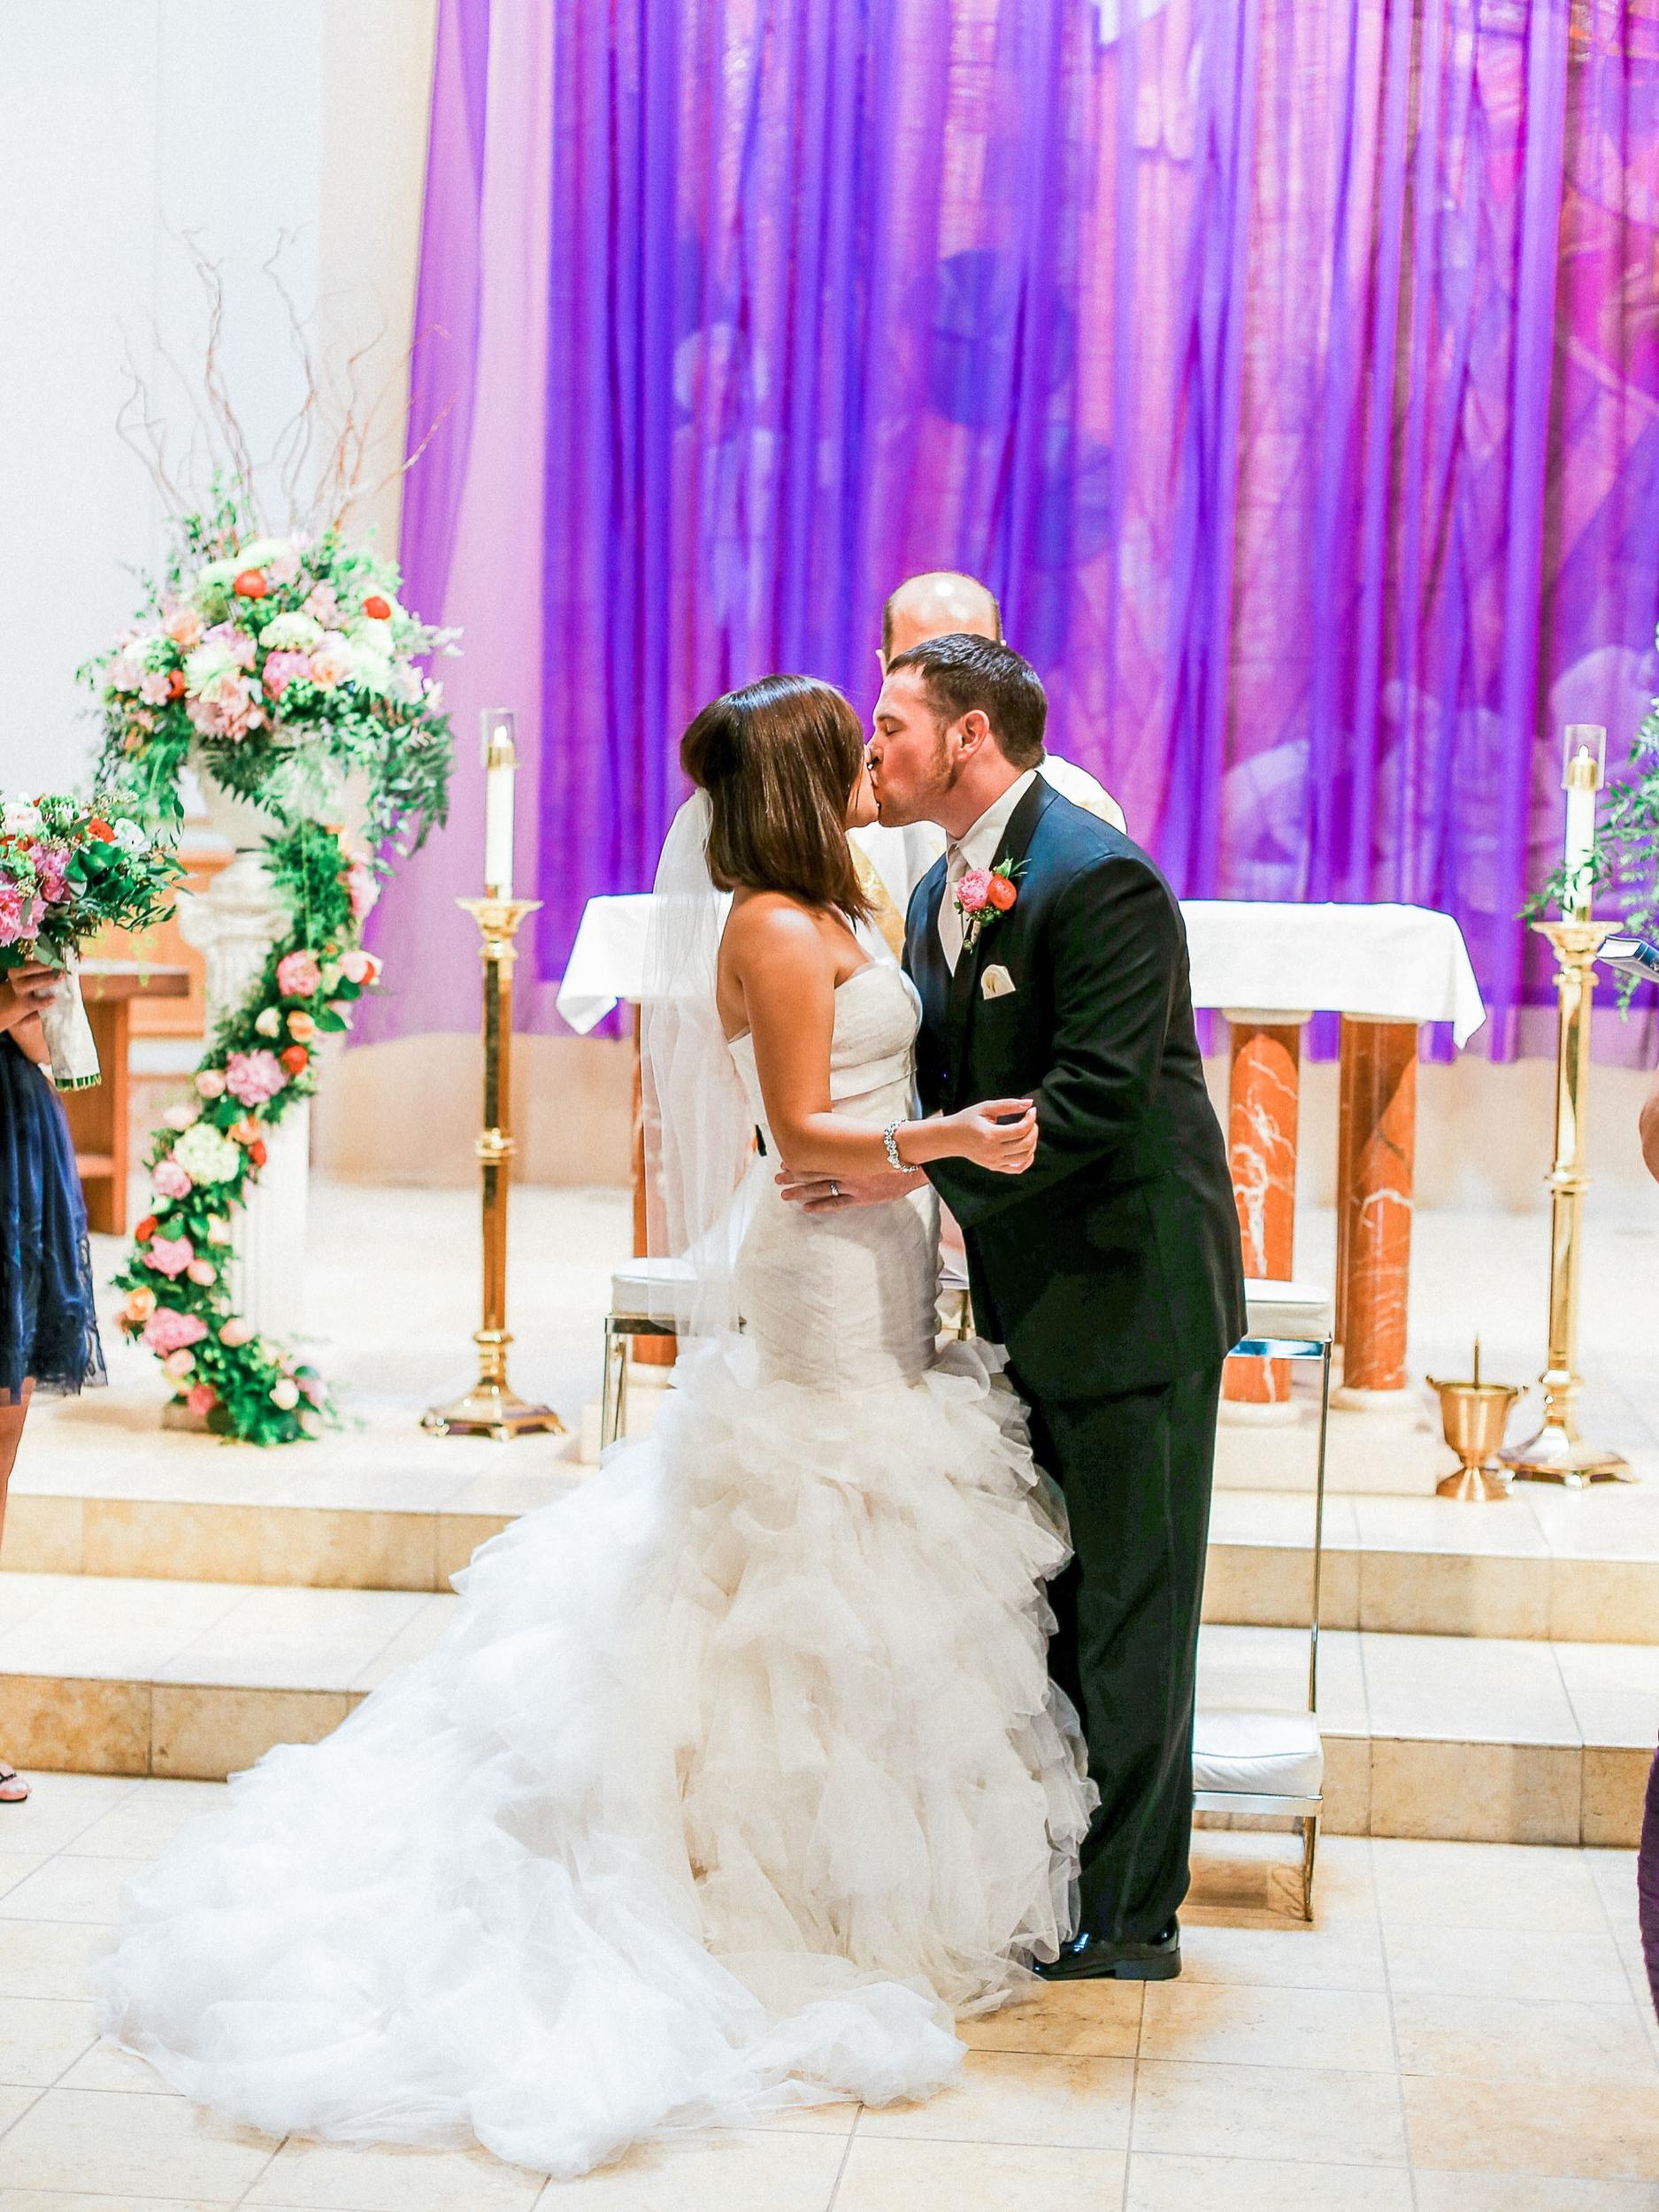 Rose + Nick Wedding at St. Mary Magdalen Church // www.kristalajara.com